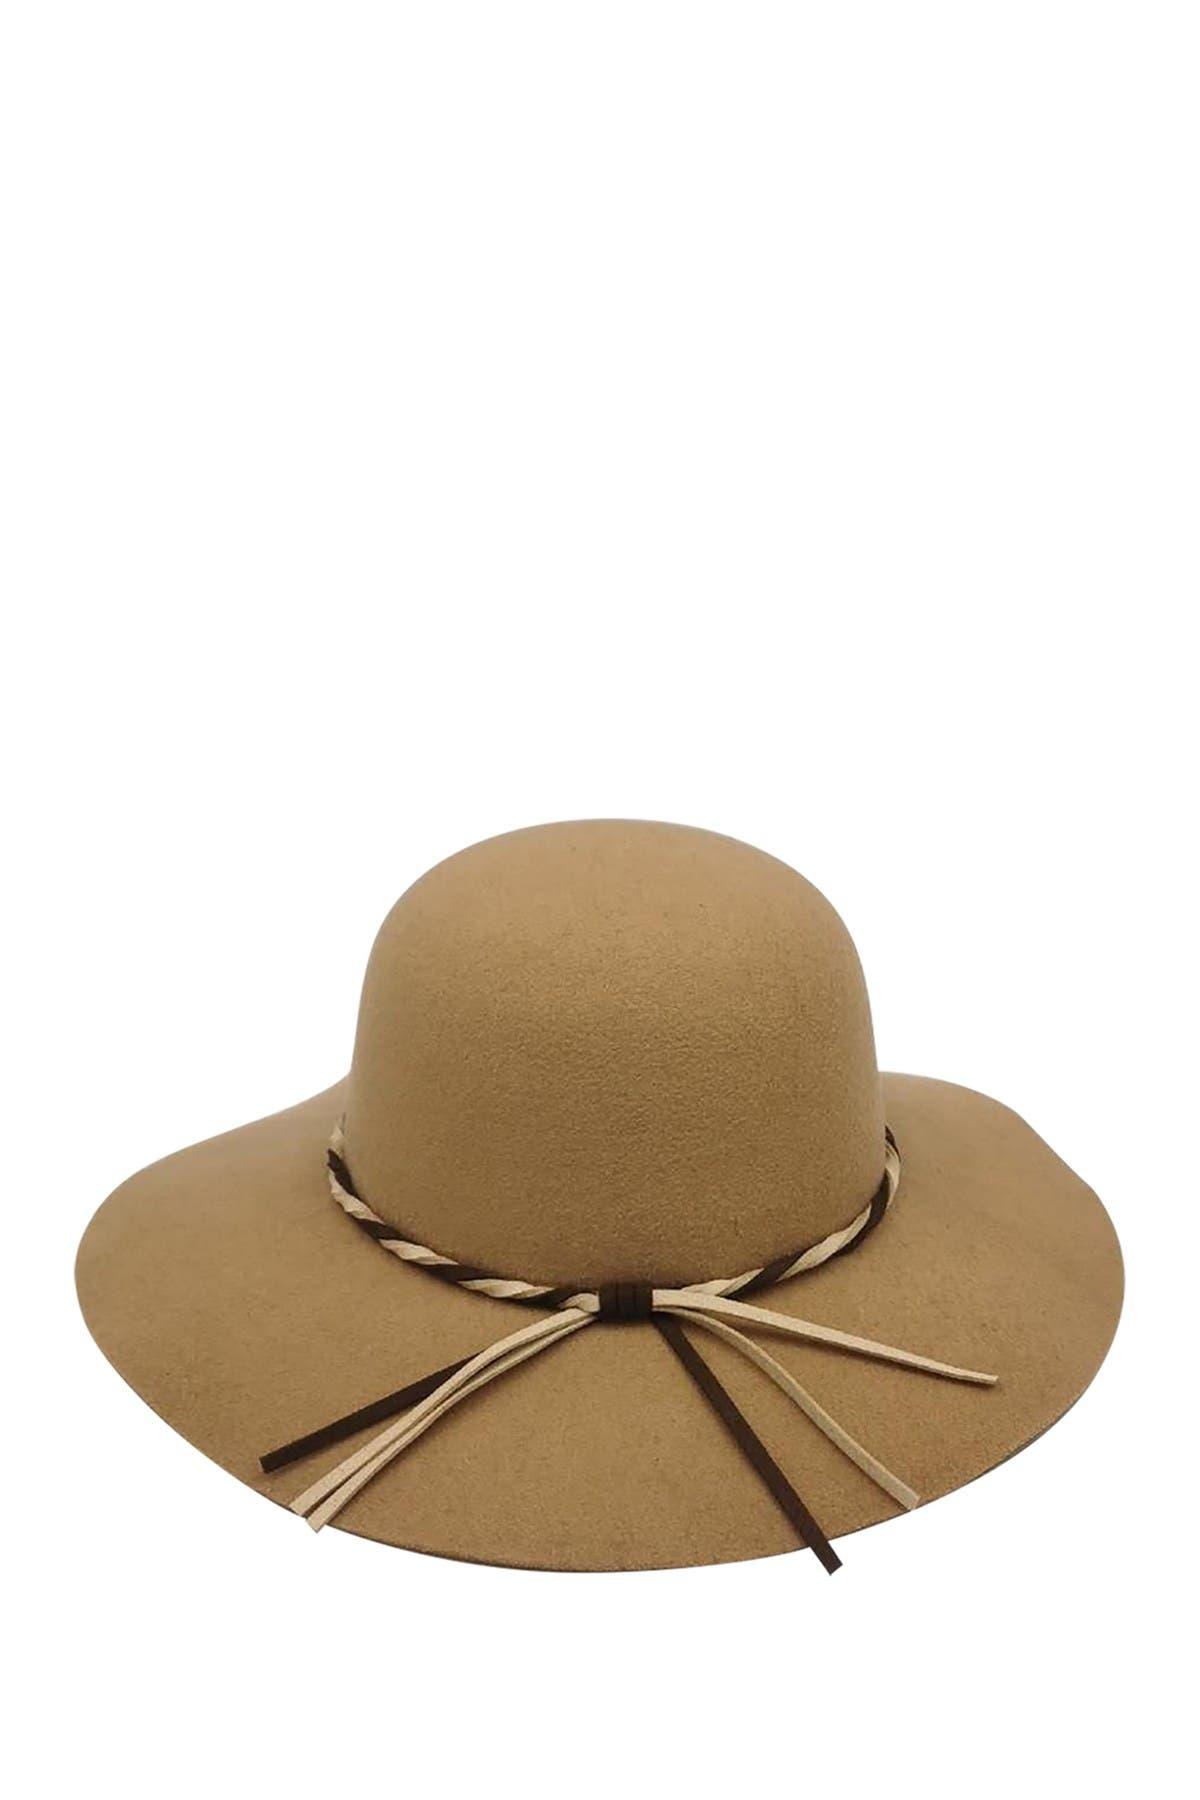 Image of Peter Grimm Headwear Evelyn Felt Floppy Hat